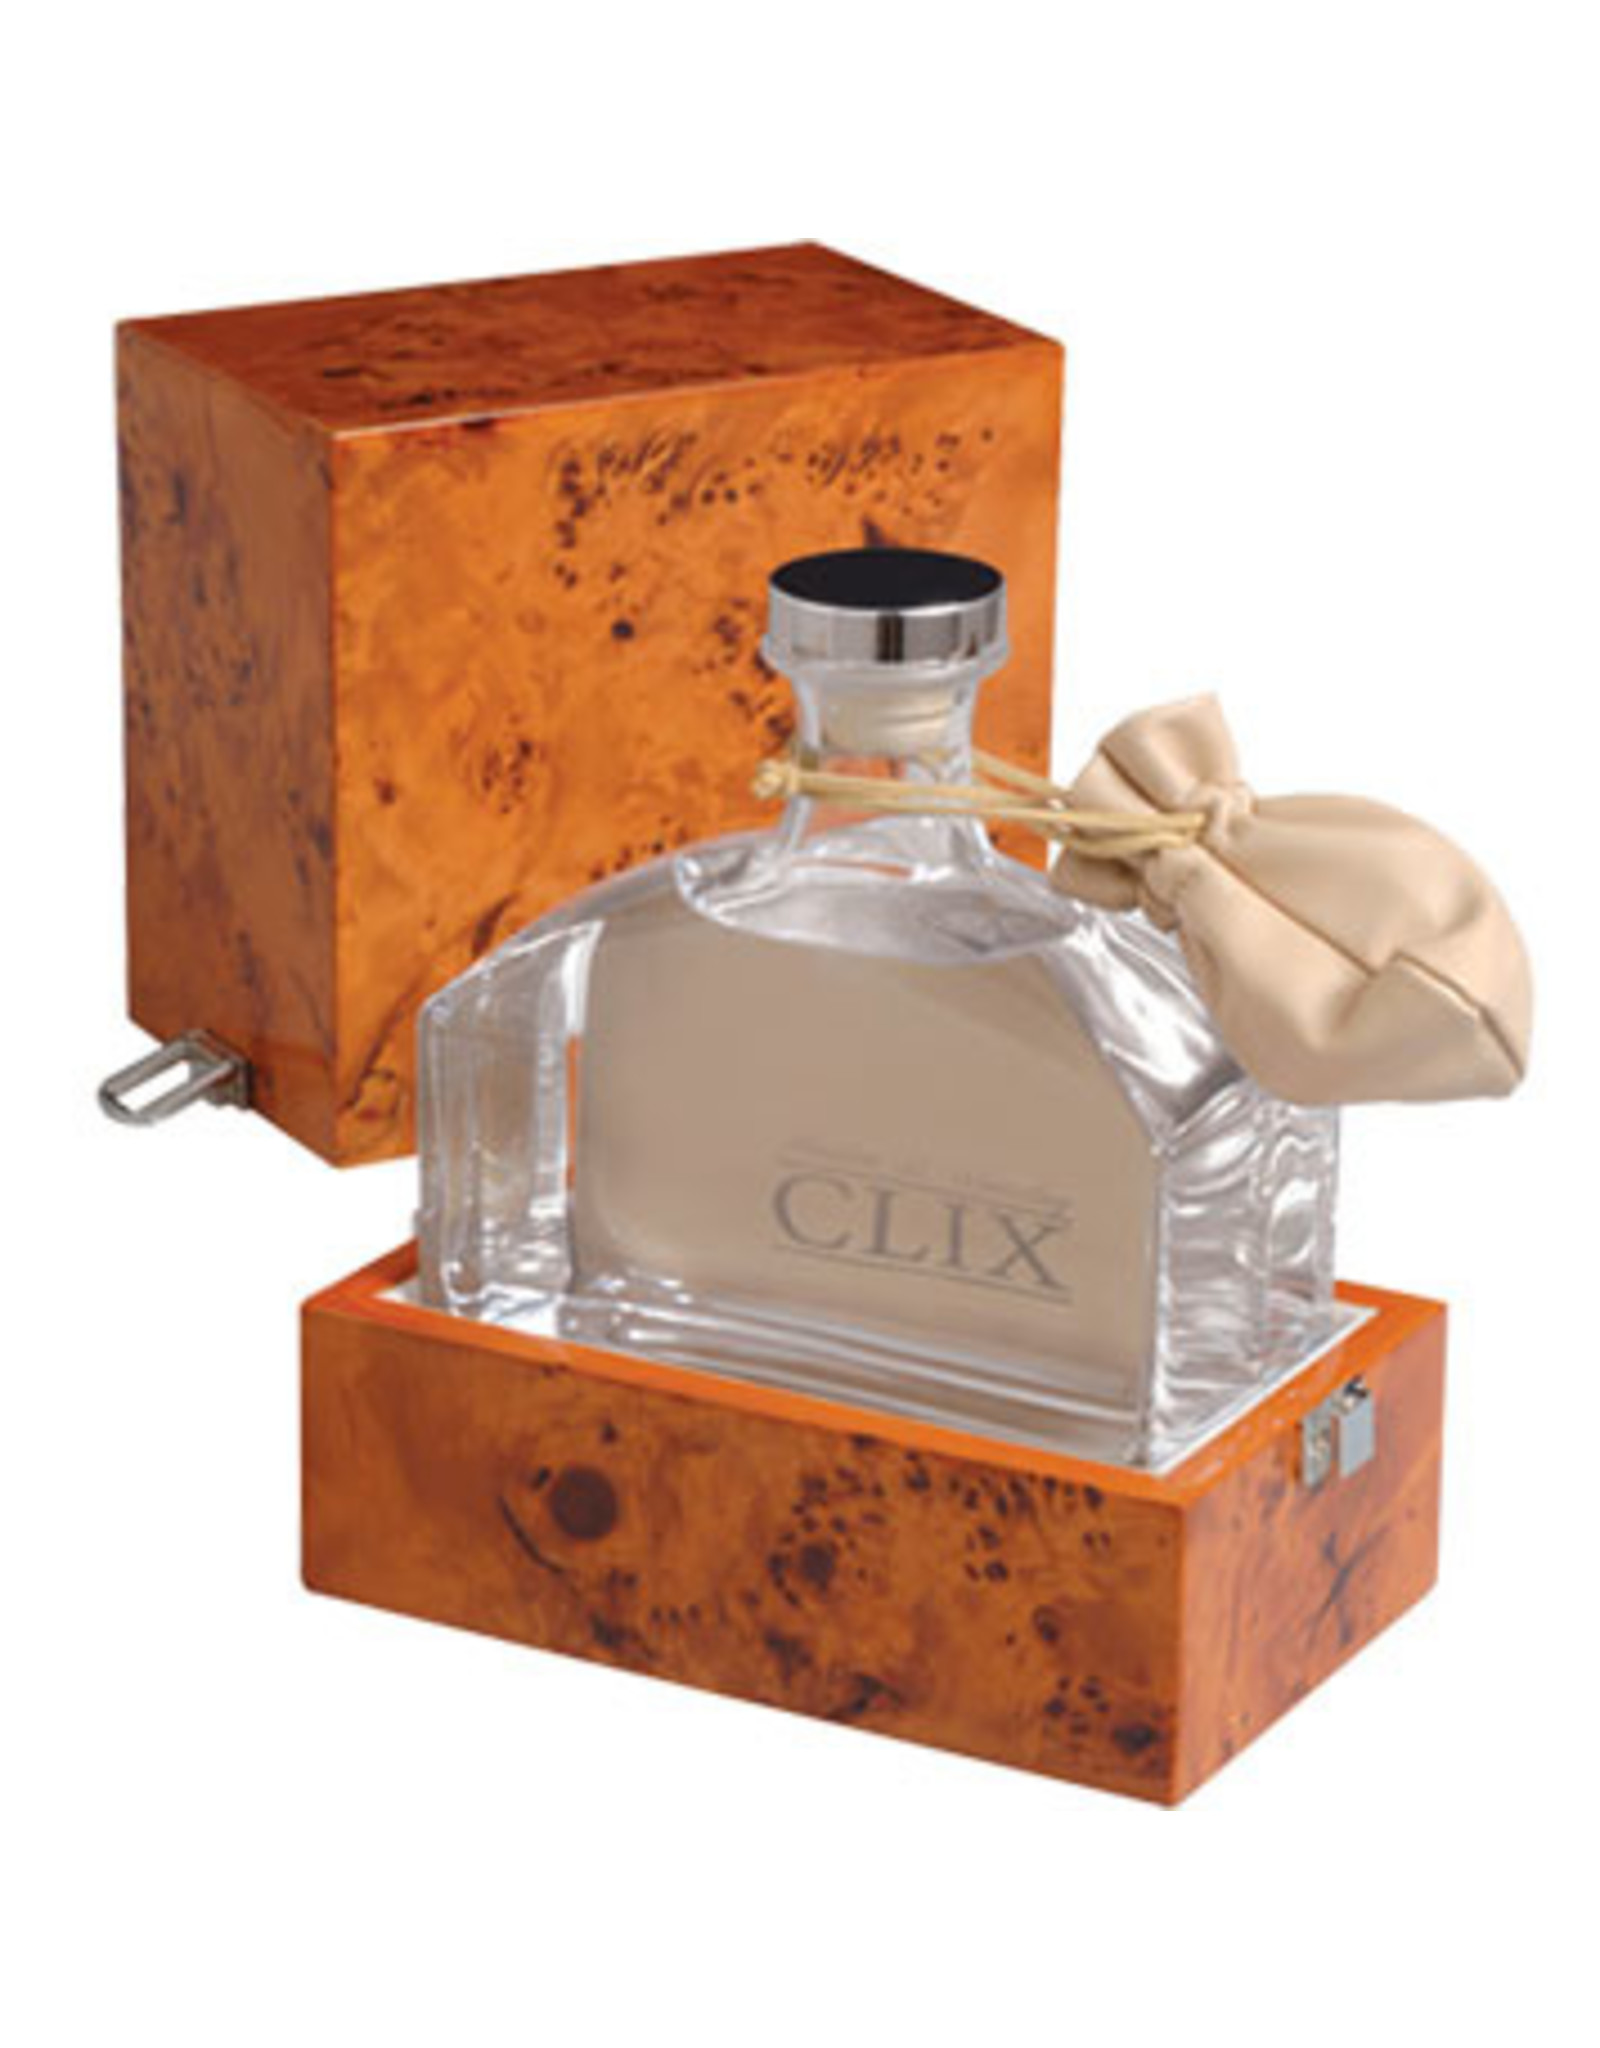 Harlen D. Wheatley CLIX Vodka